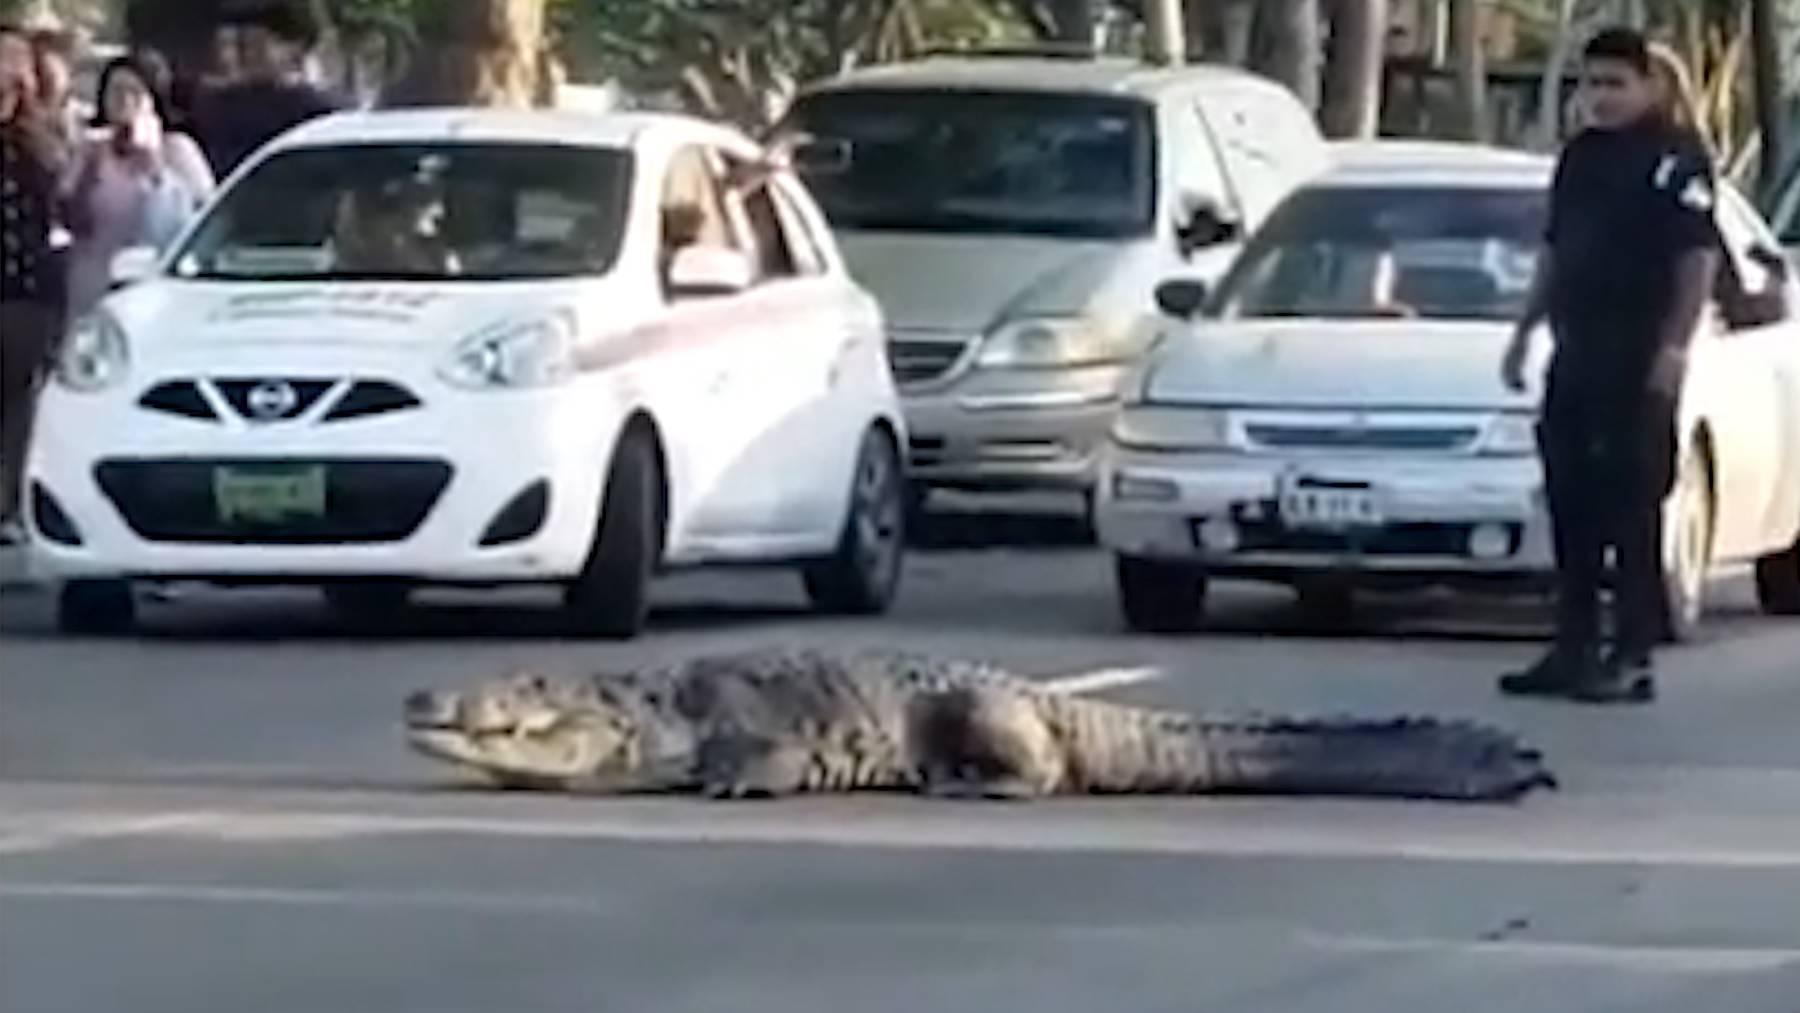 Krokodil legt in Mexiko Verkehr lahm